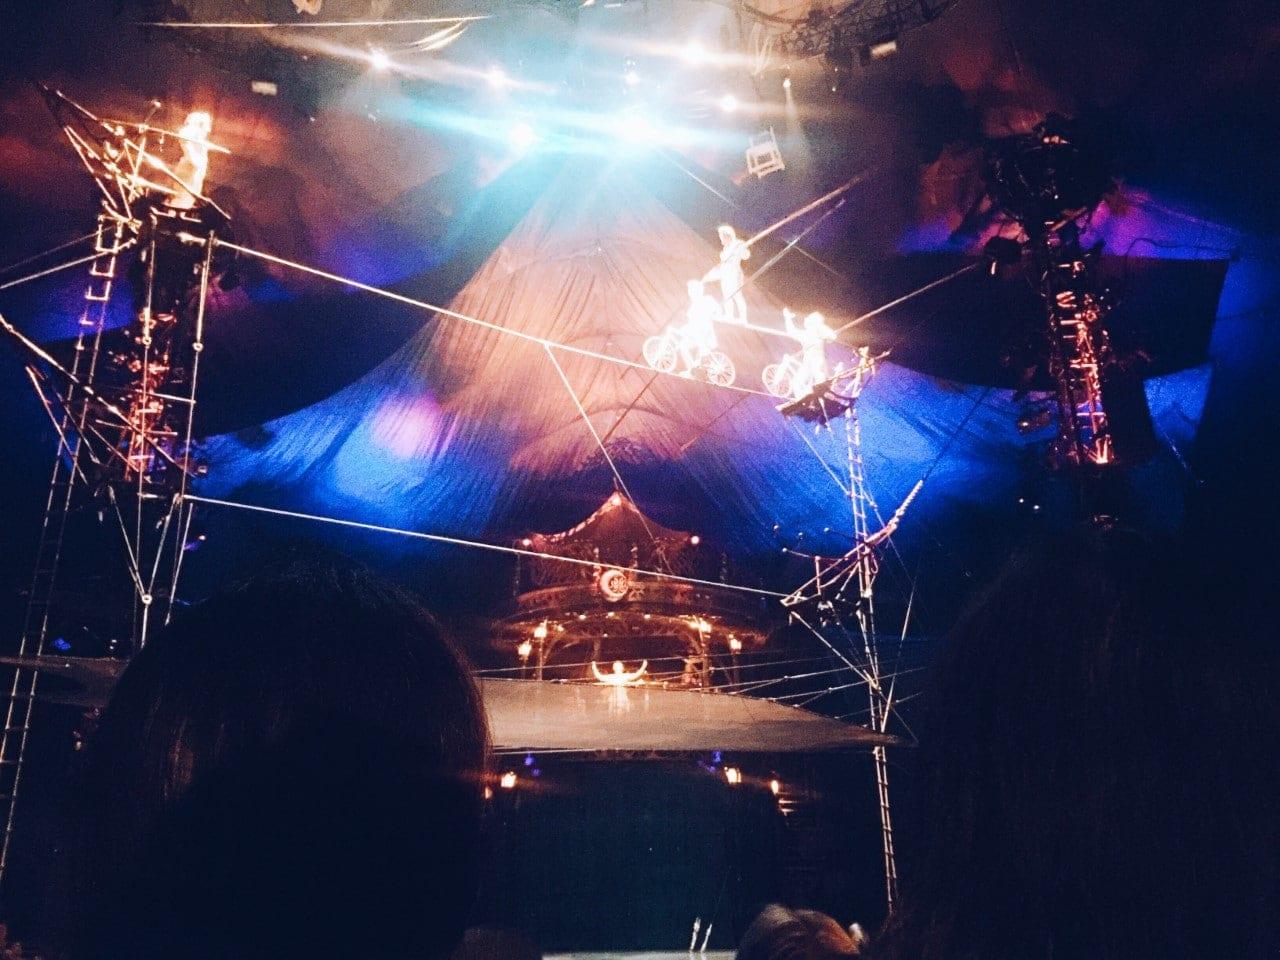 Kooza-cirque-du-soleil-review-1